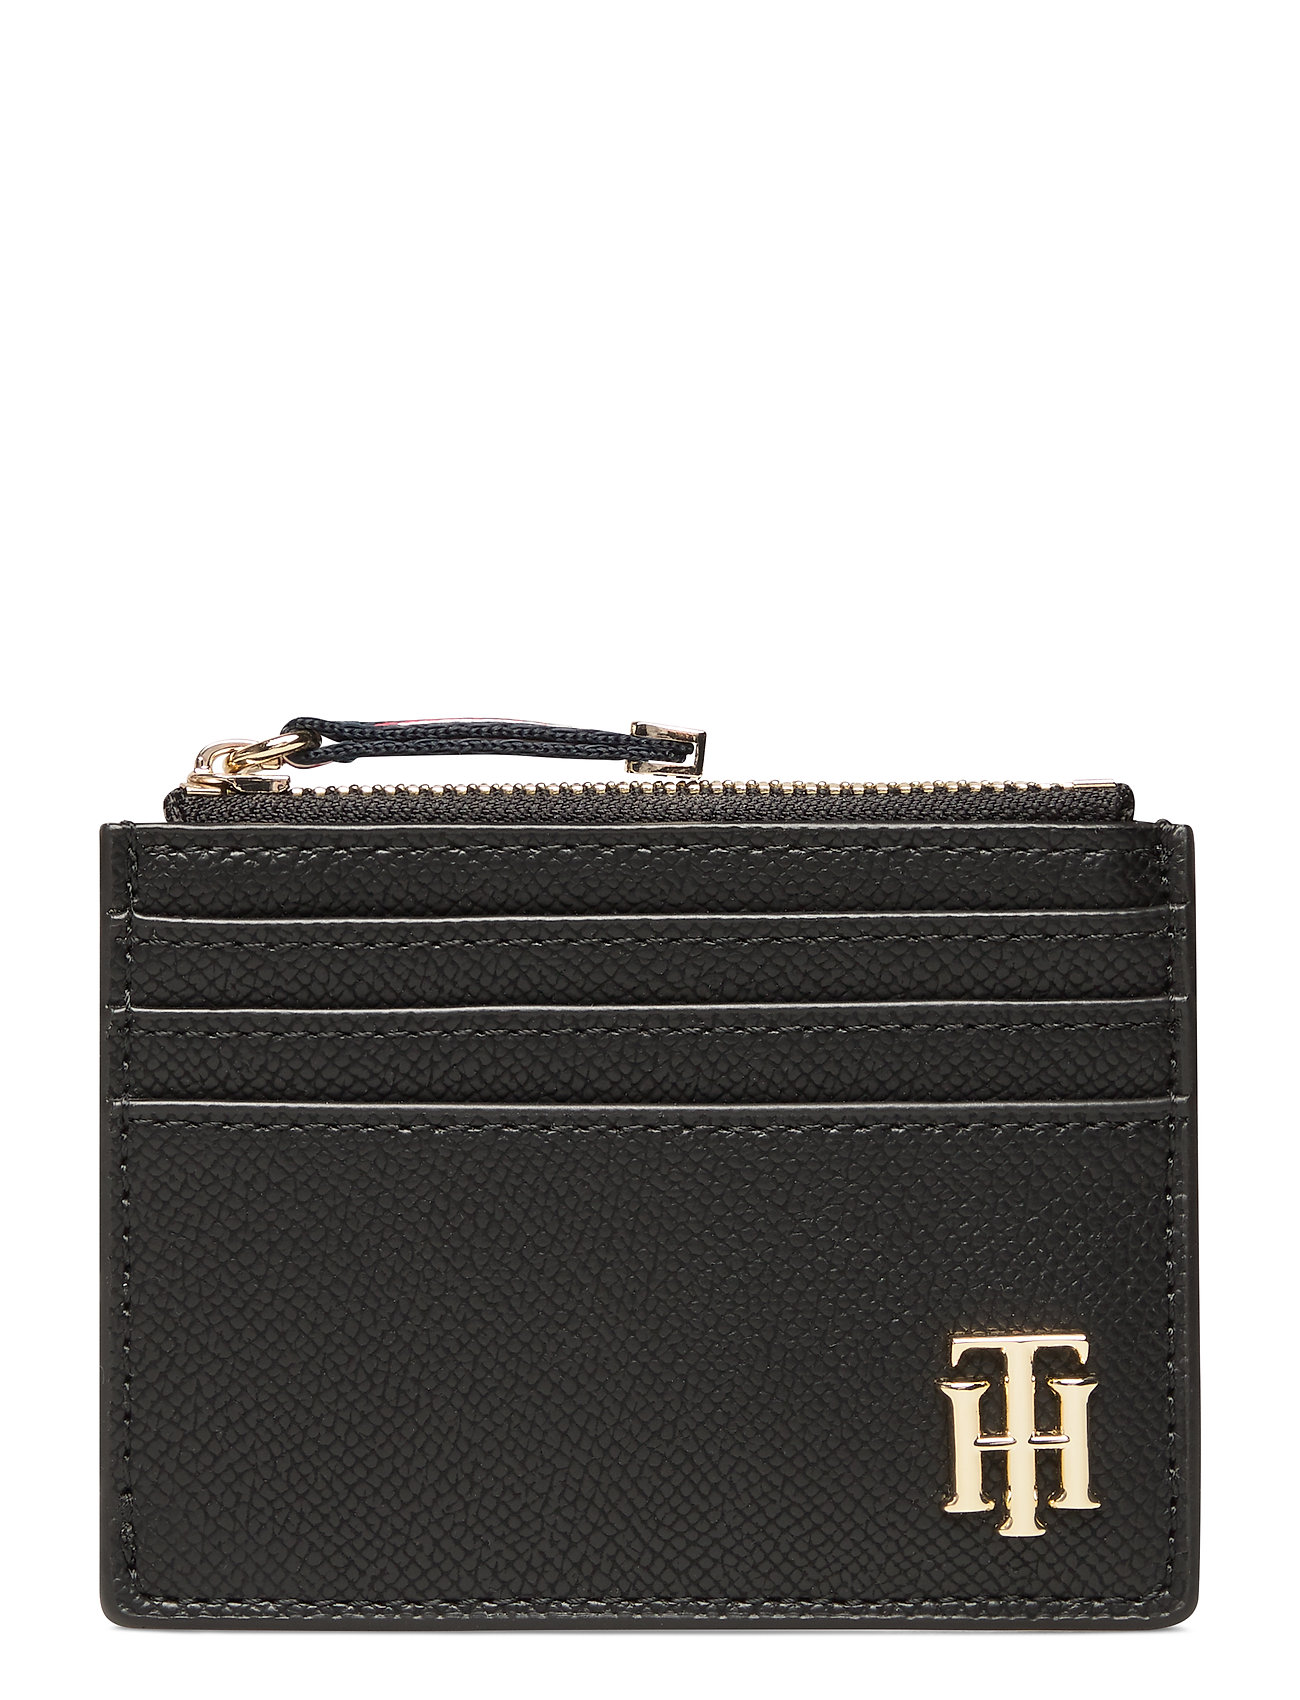 Image of Saffiano Cc Holder Bags Card Holders & Wallets Card Holder Sort Tommy Hilfiger (3413355367)